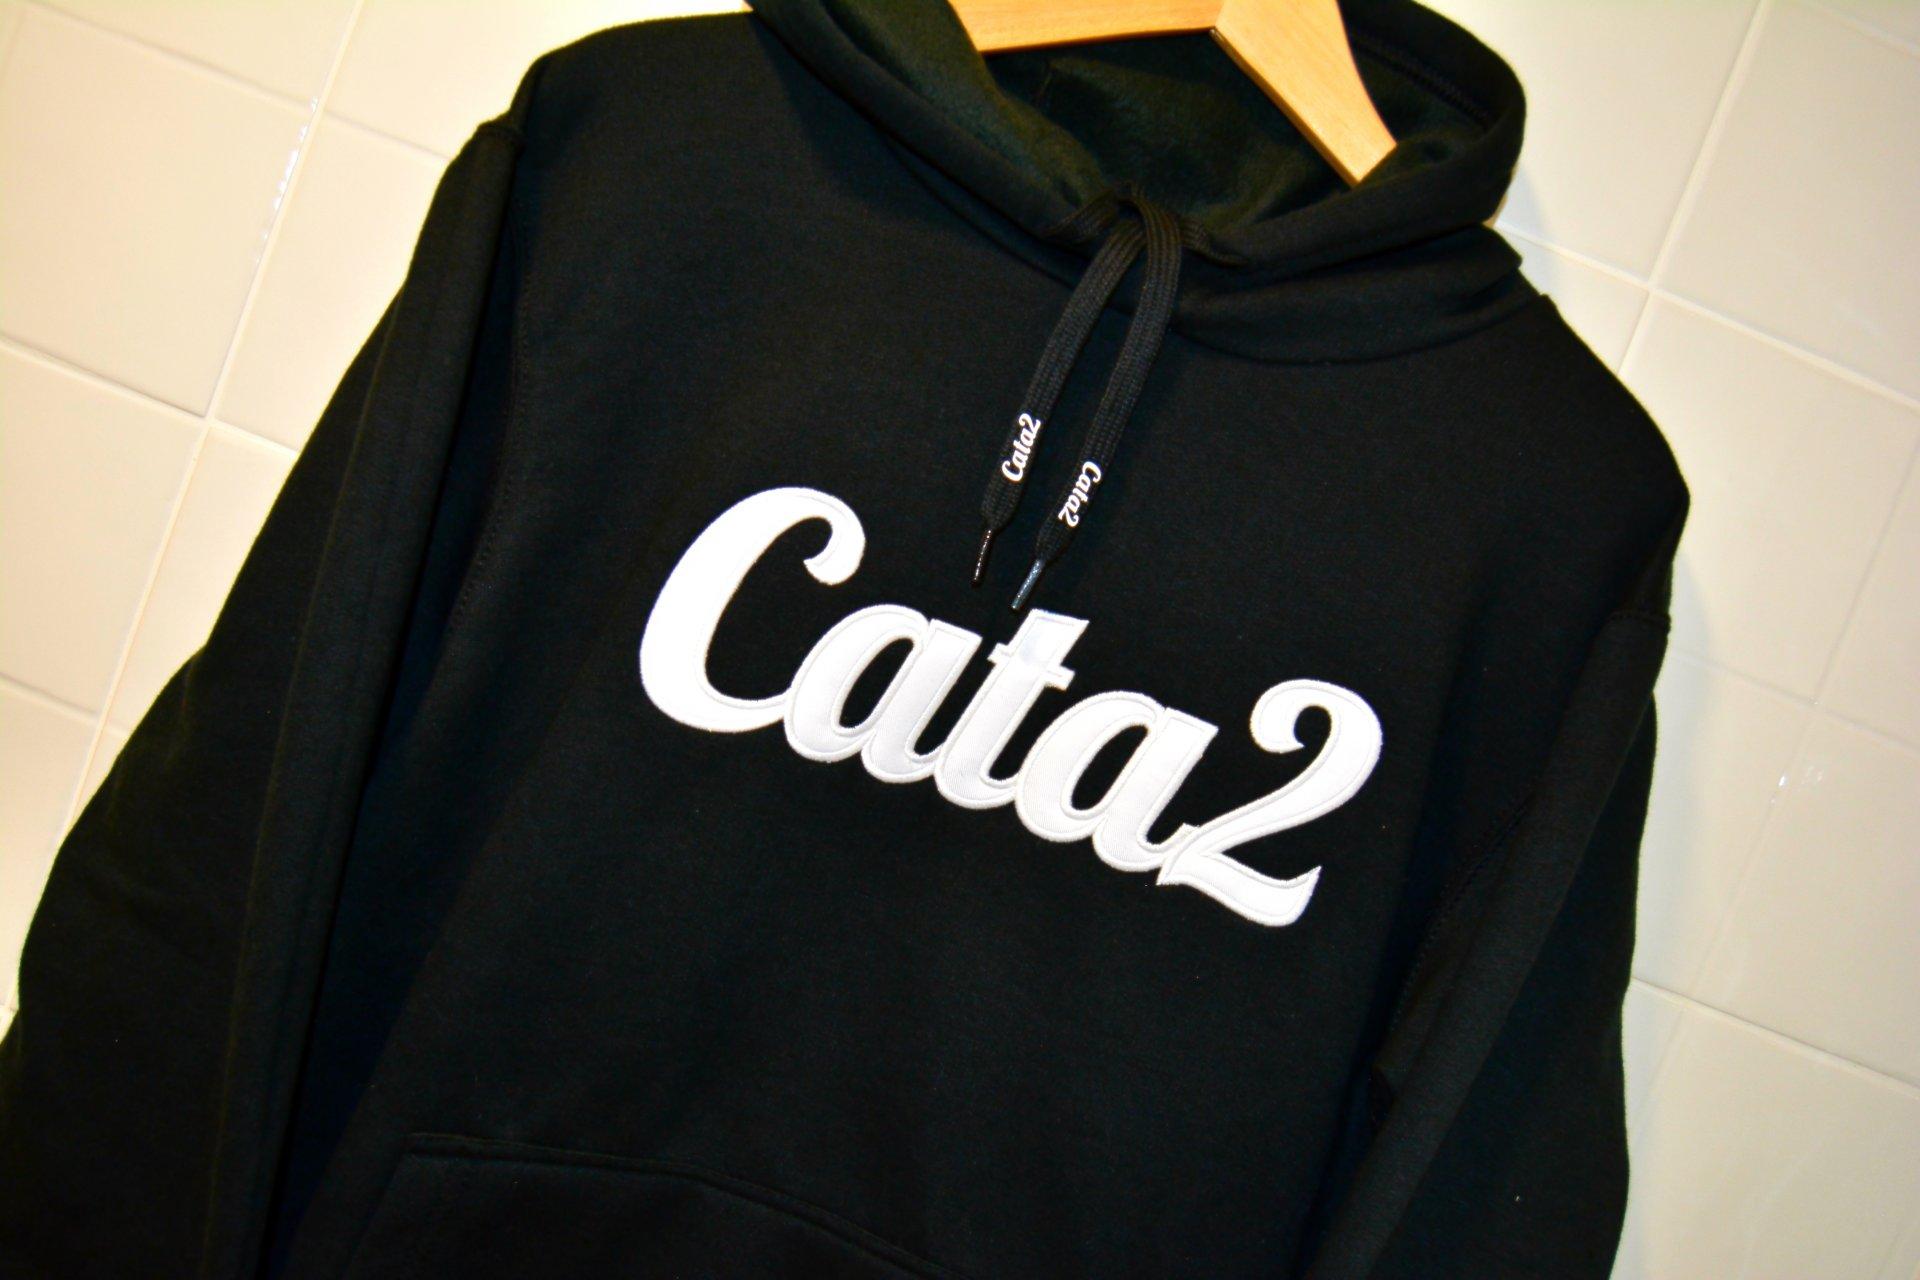 03 - CATA DÍAZ (3).jpg